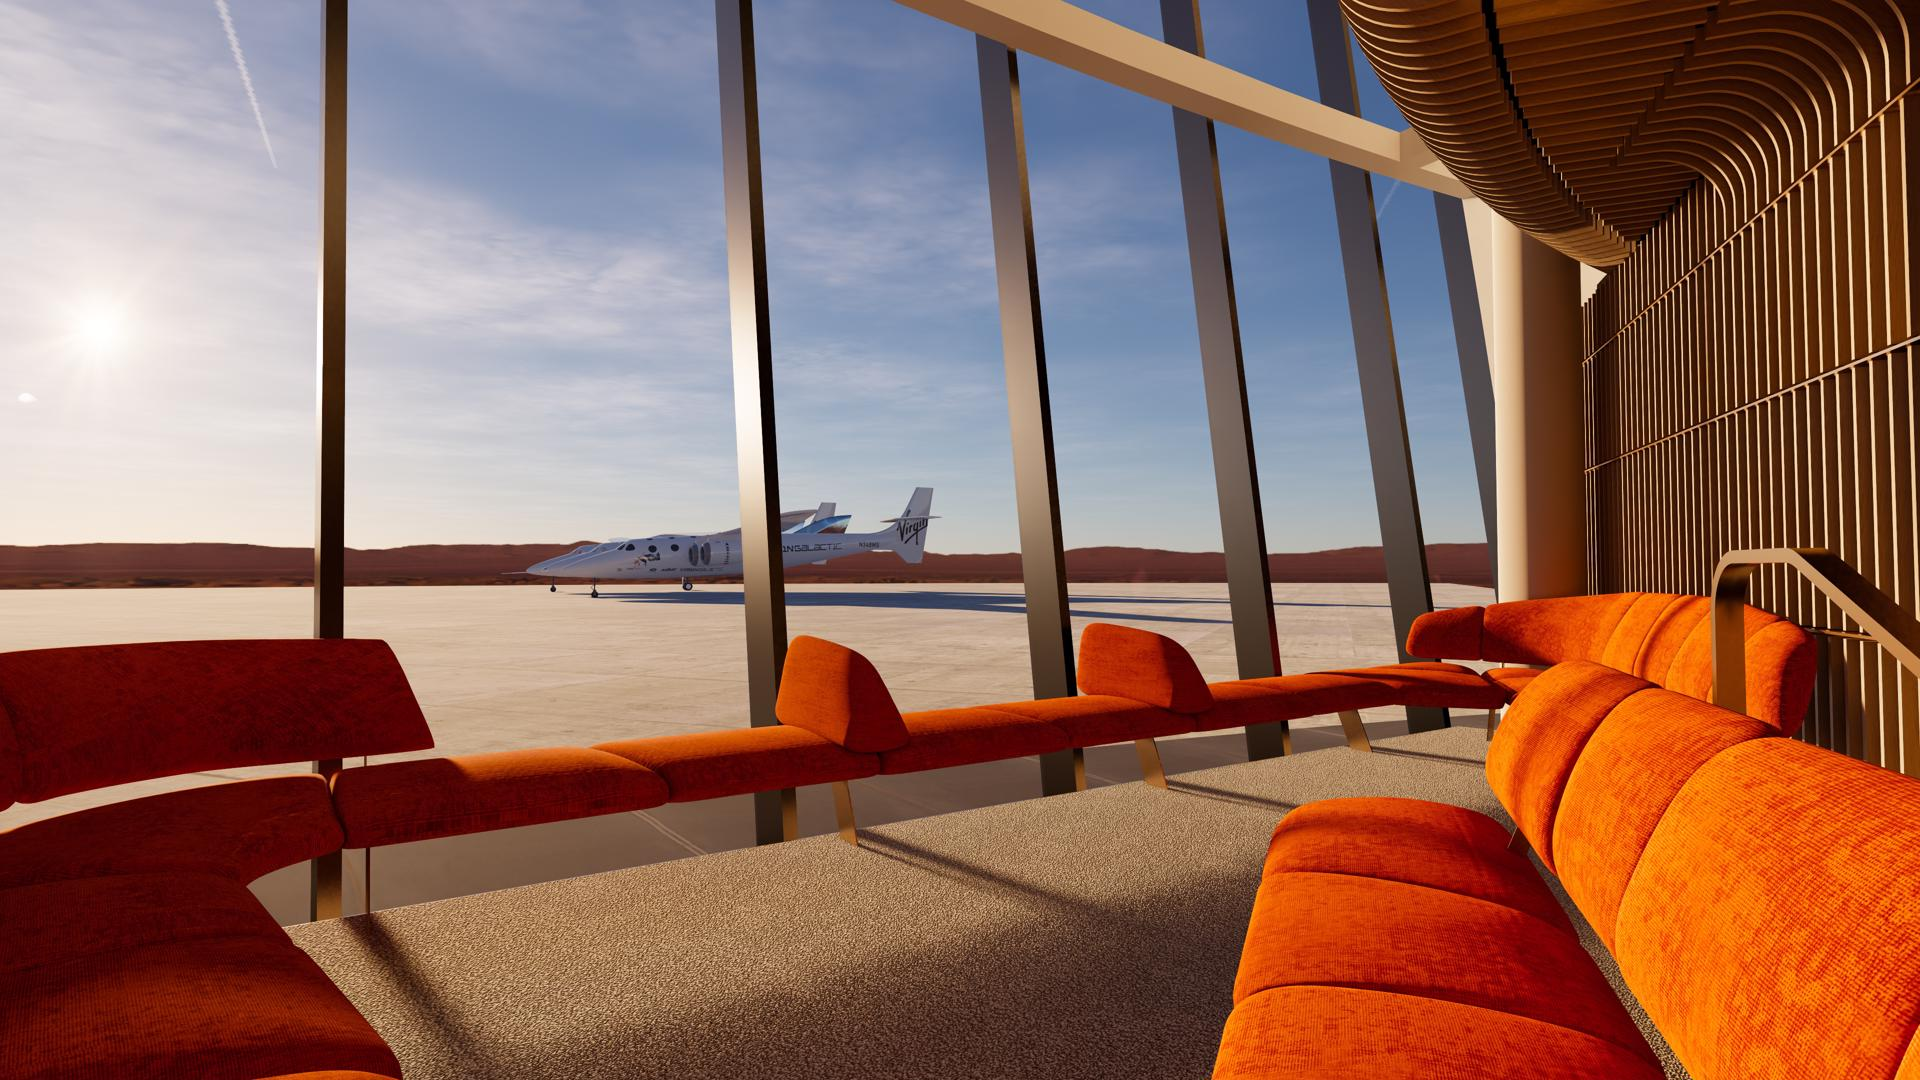 Viewport Studio Spaceport America window lounge